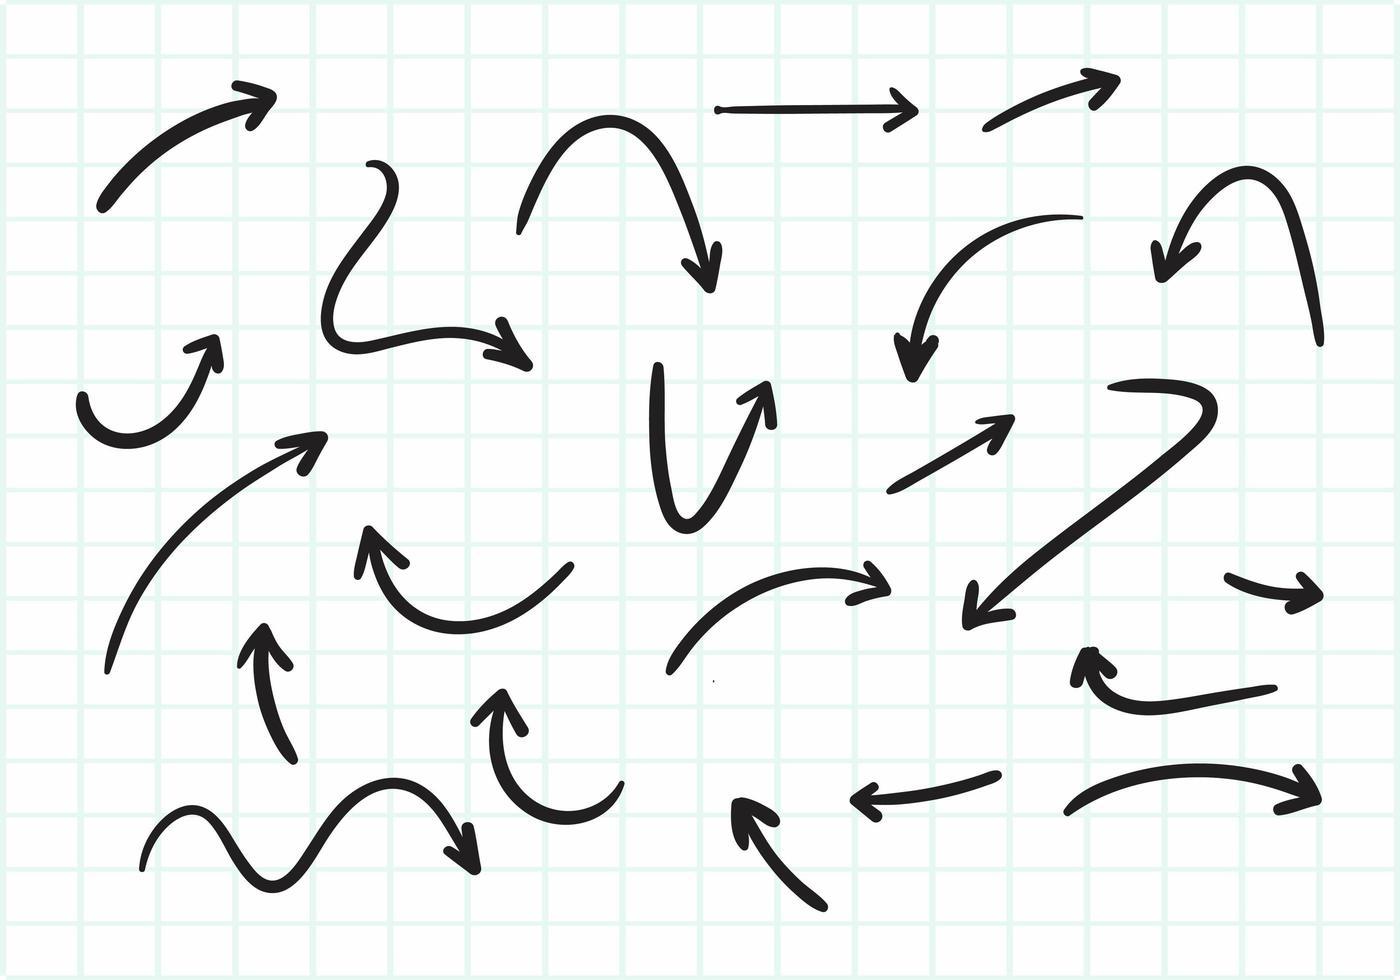 conjunto de flechas dibujadas a mano vector